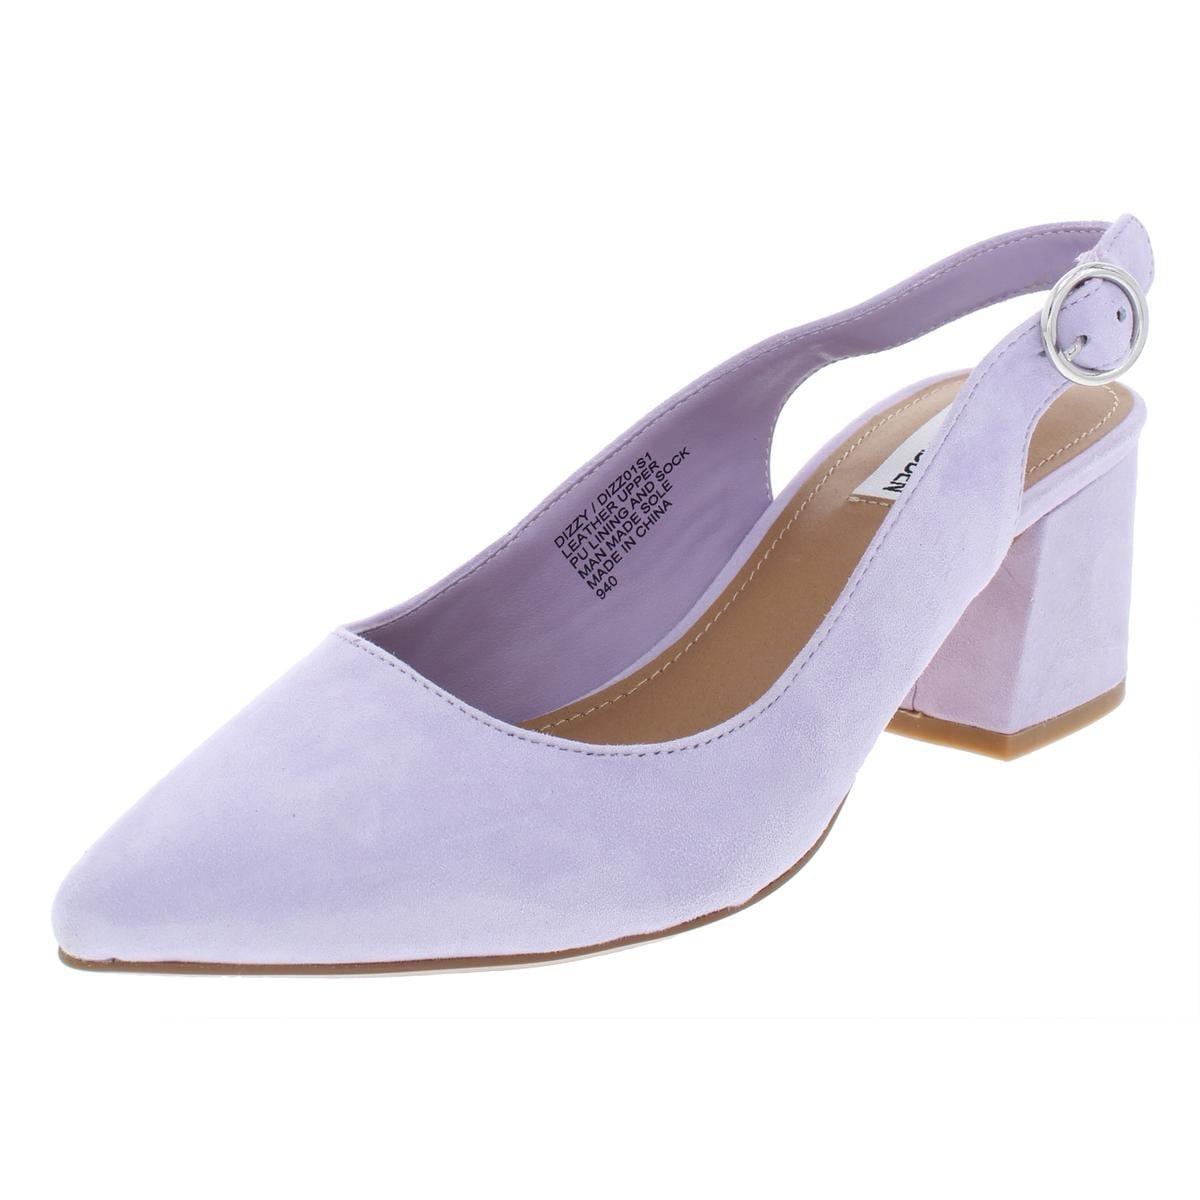 297617ab167 Steve Madden Womens Dizzy Slingback Sandals Block Heel Pointed Toe